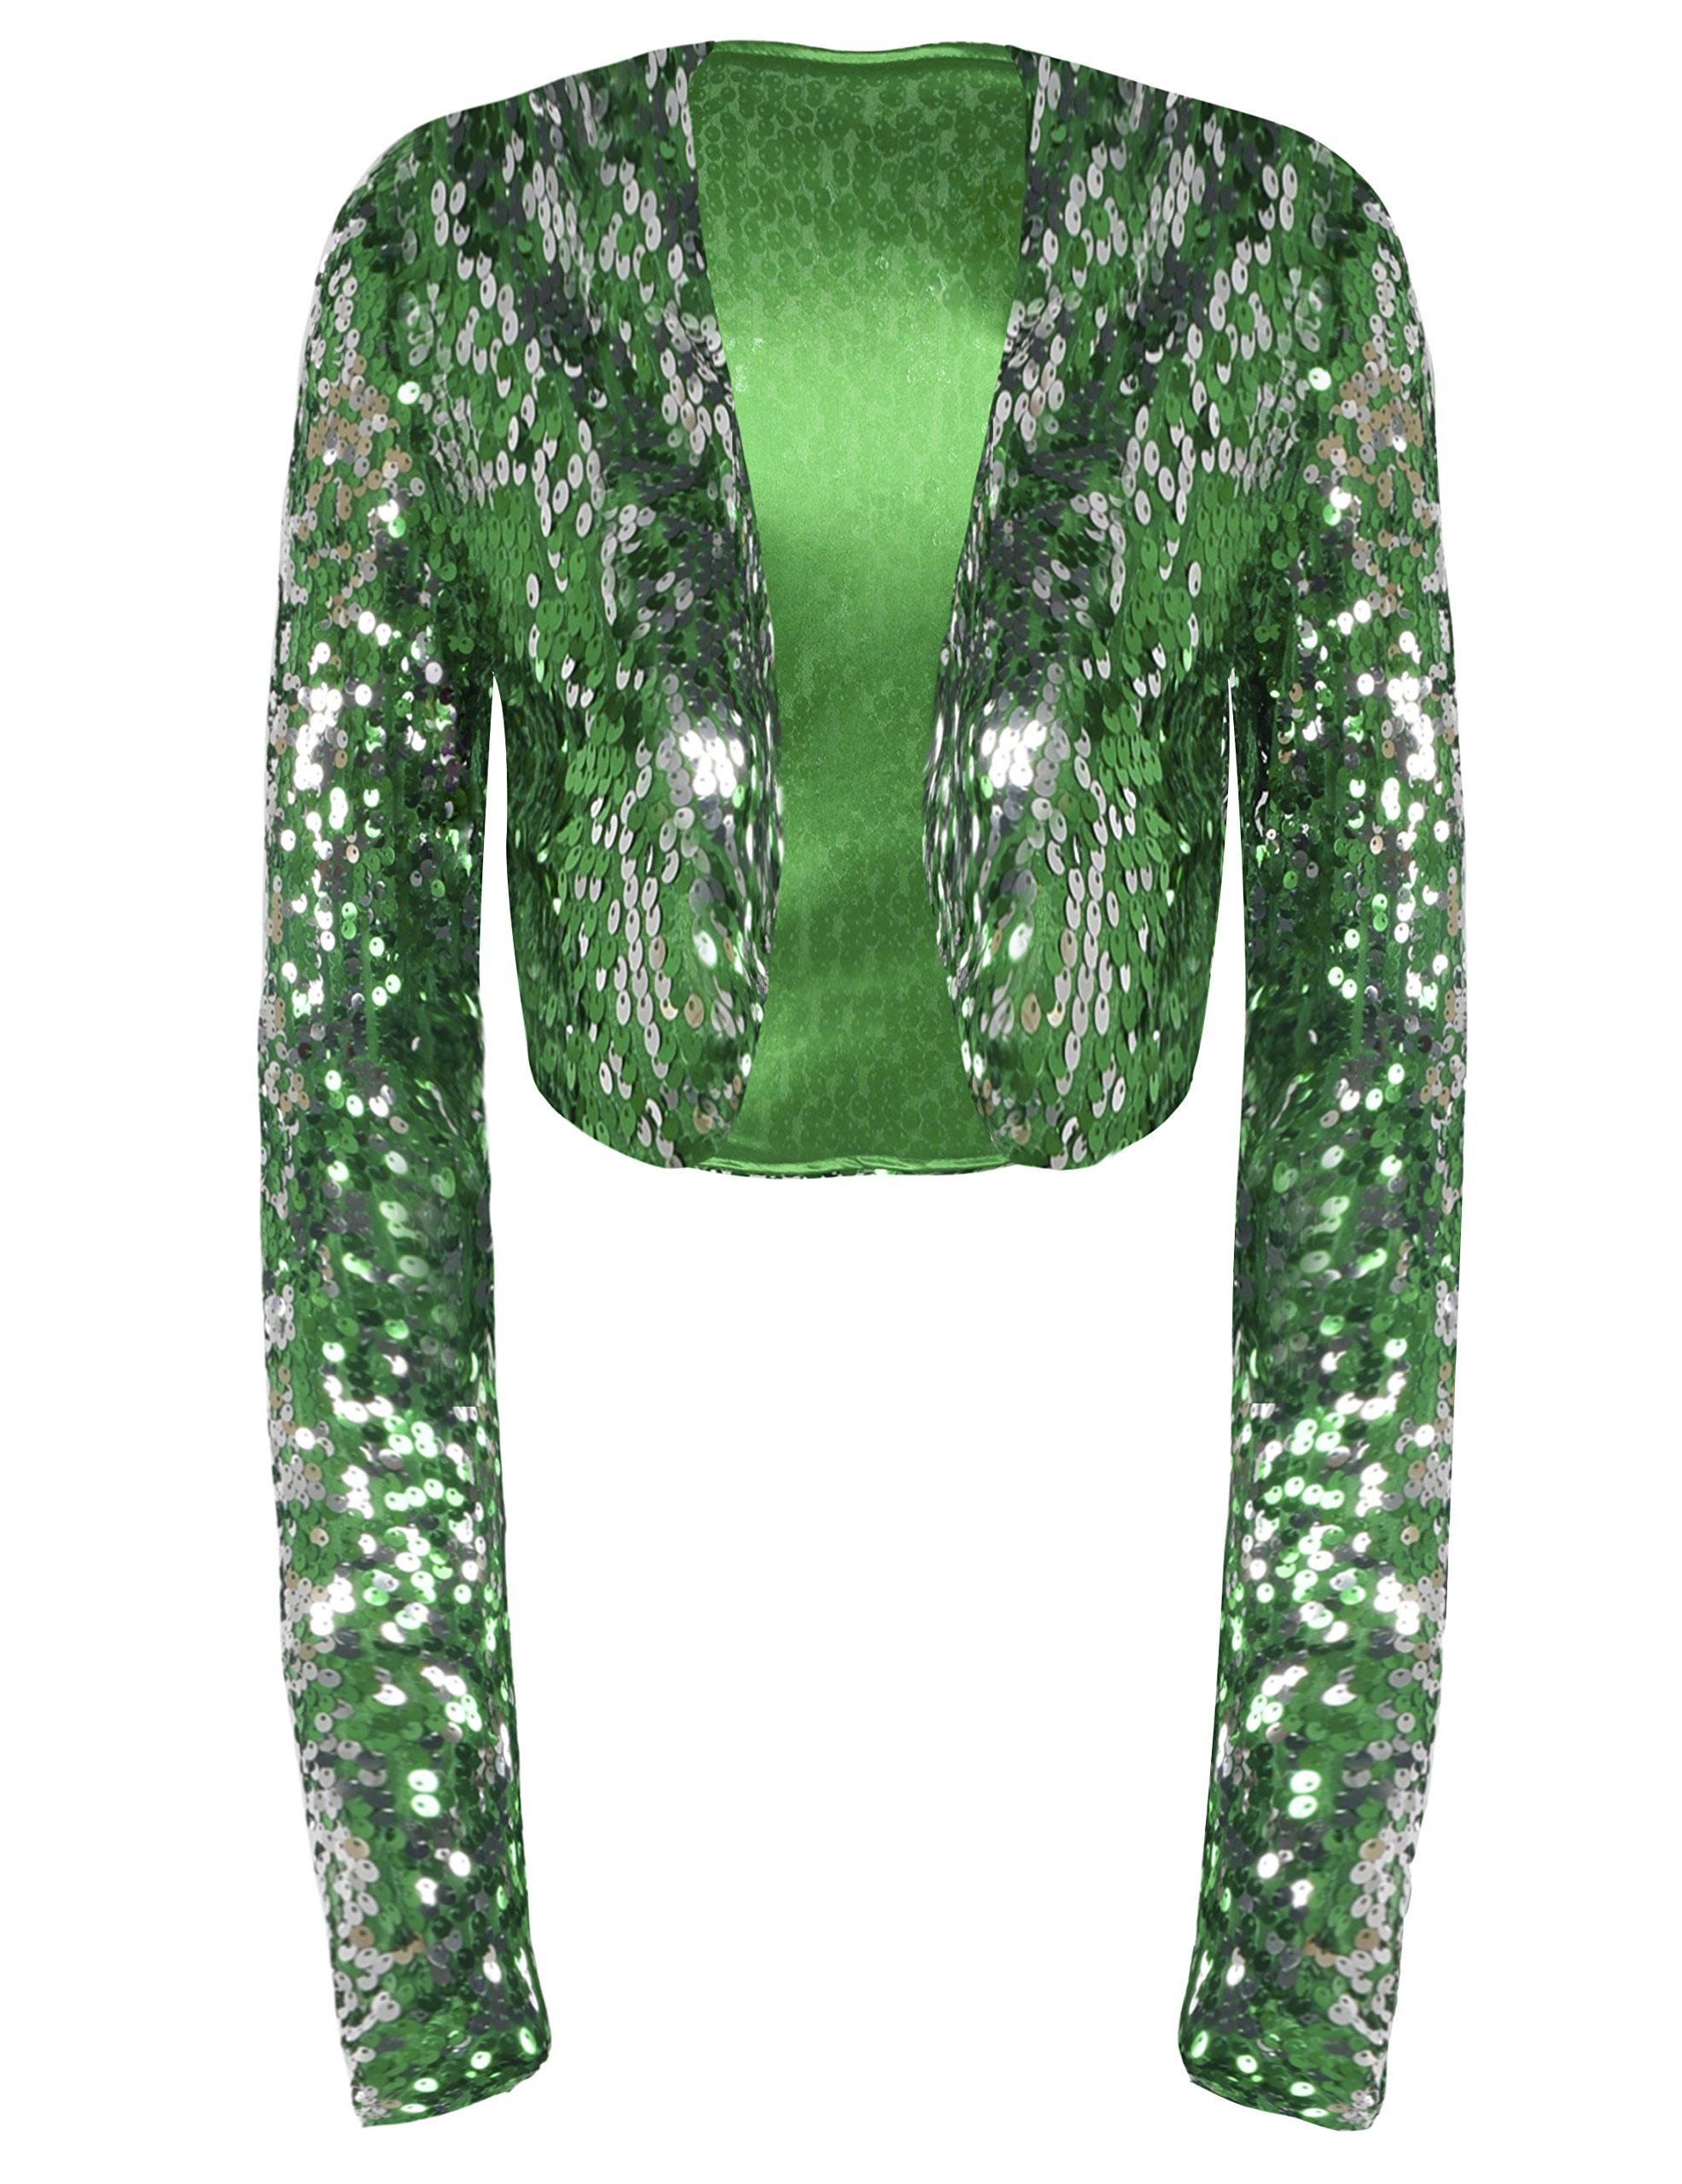 PrettyGuide Women Sequin Cropped Jacket Long Sleeve Sparkly Bolero DS Clubwear Green XL/US12-14